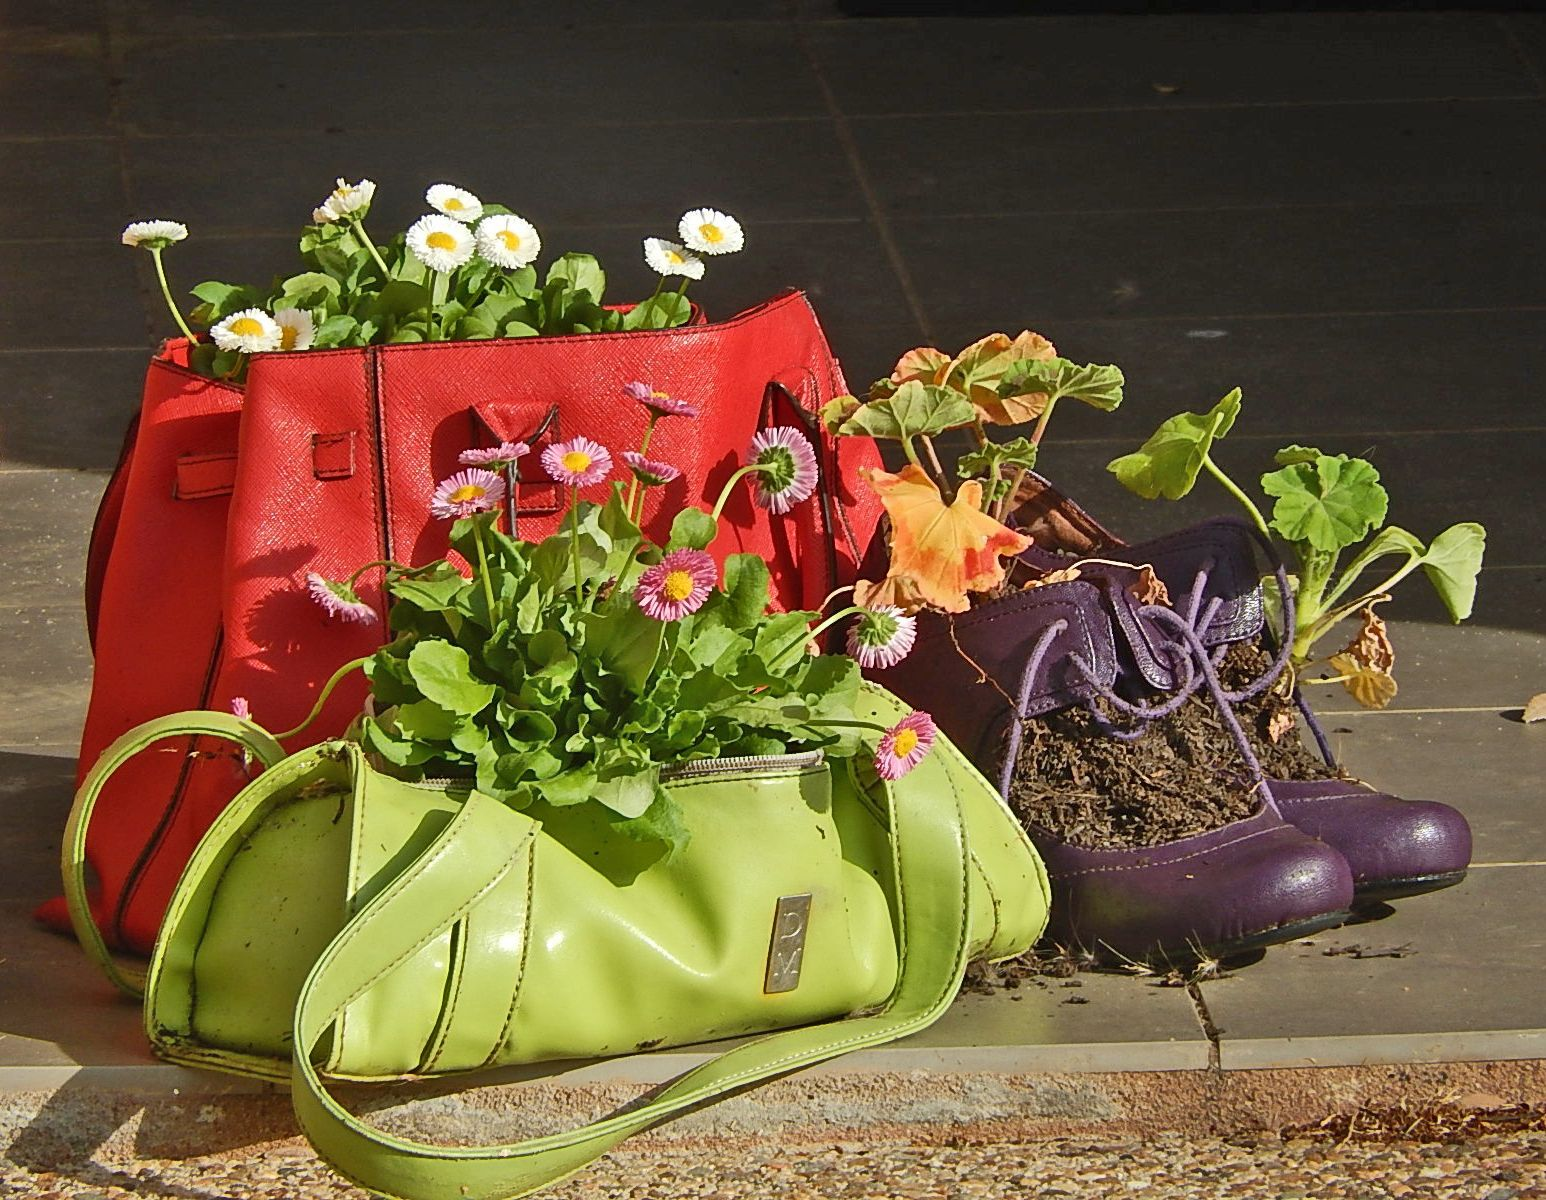 Creative planter ideas izmirmasajfo